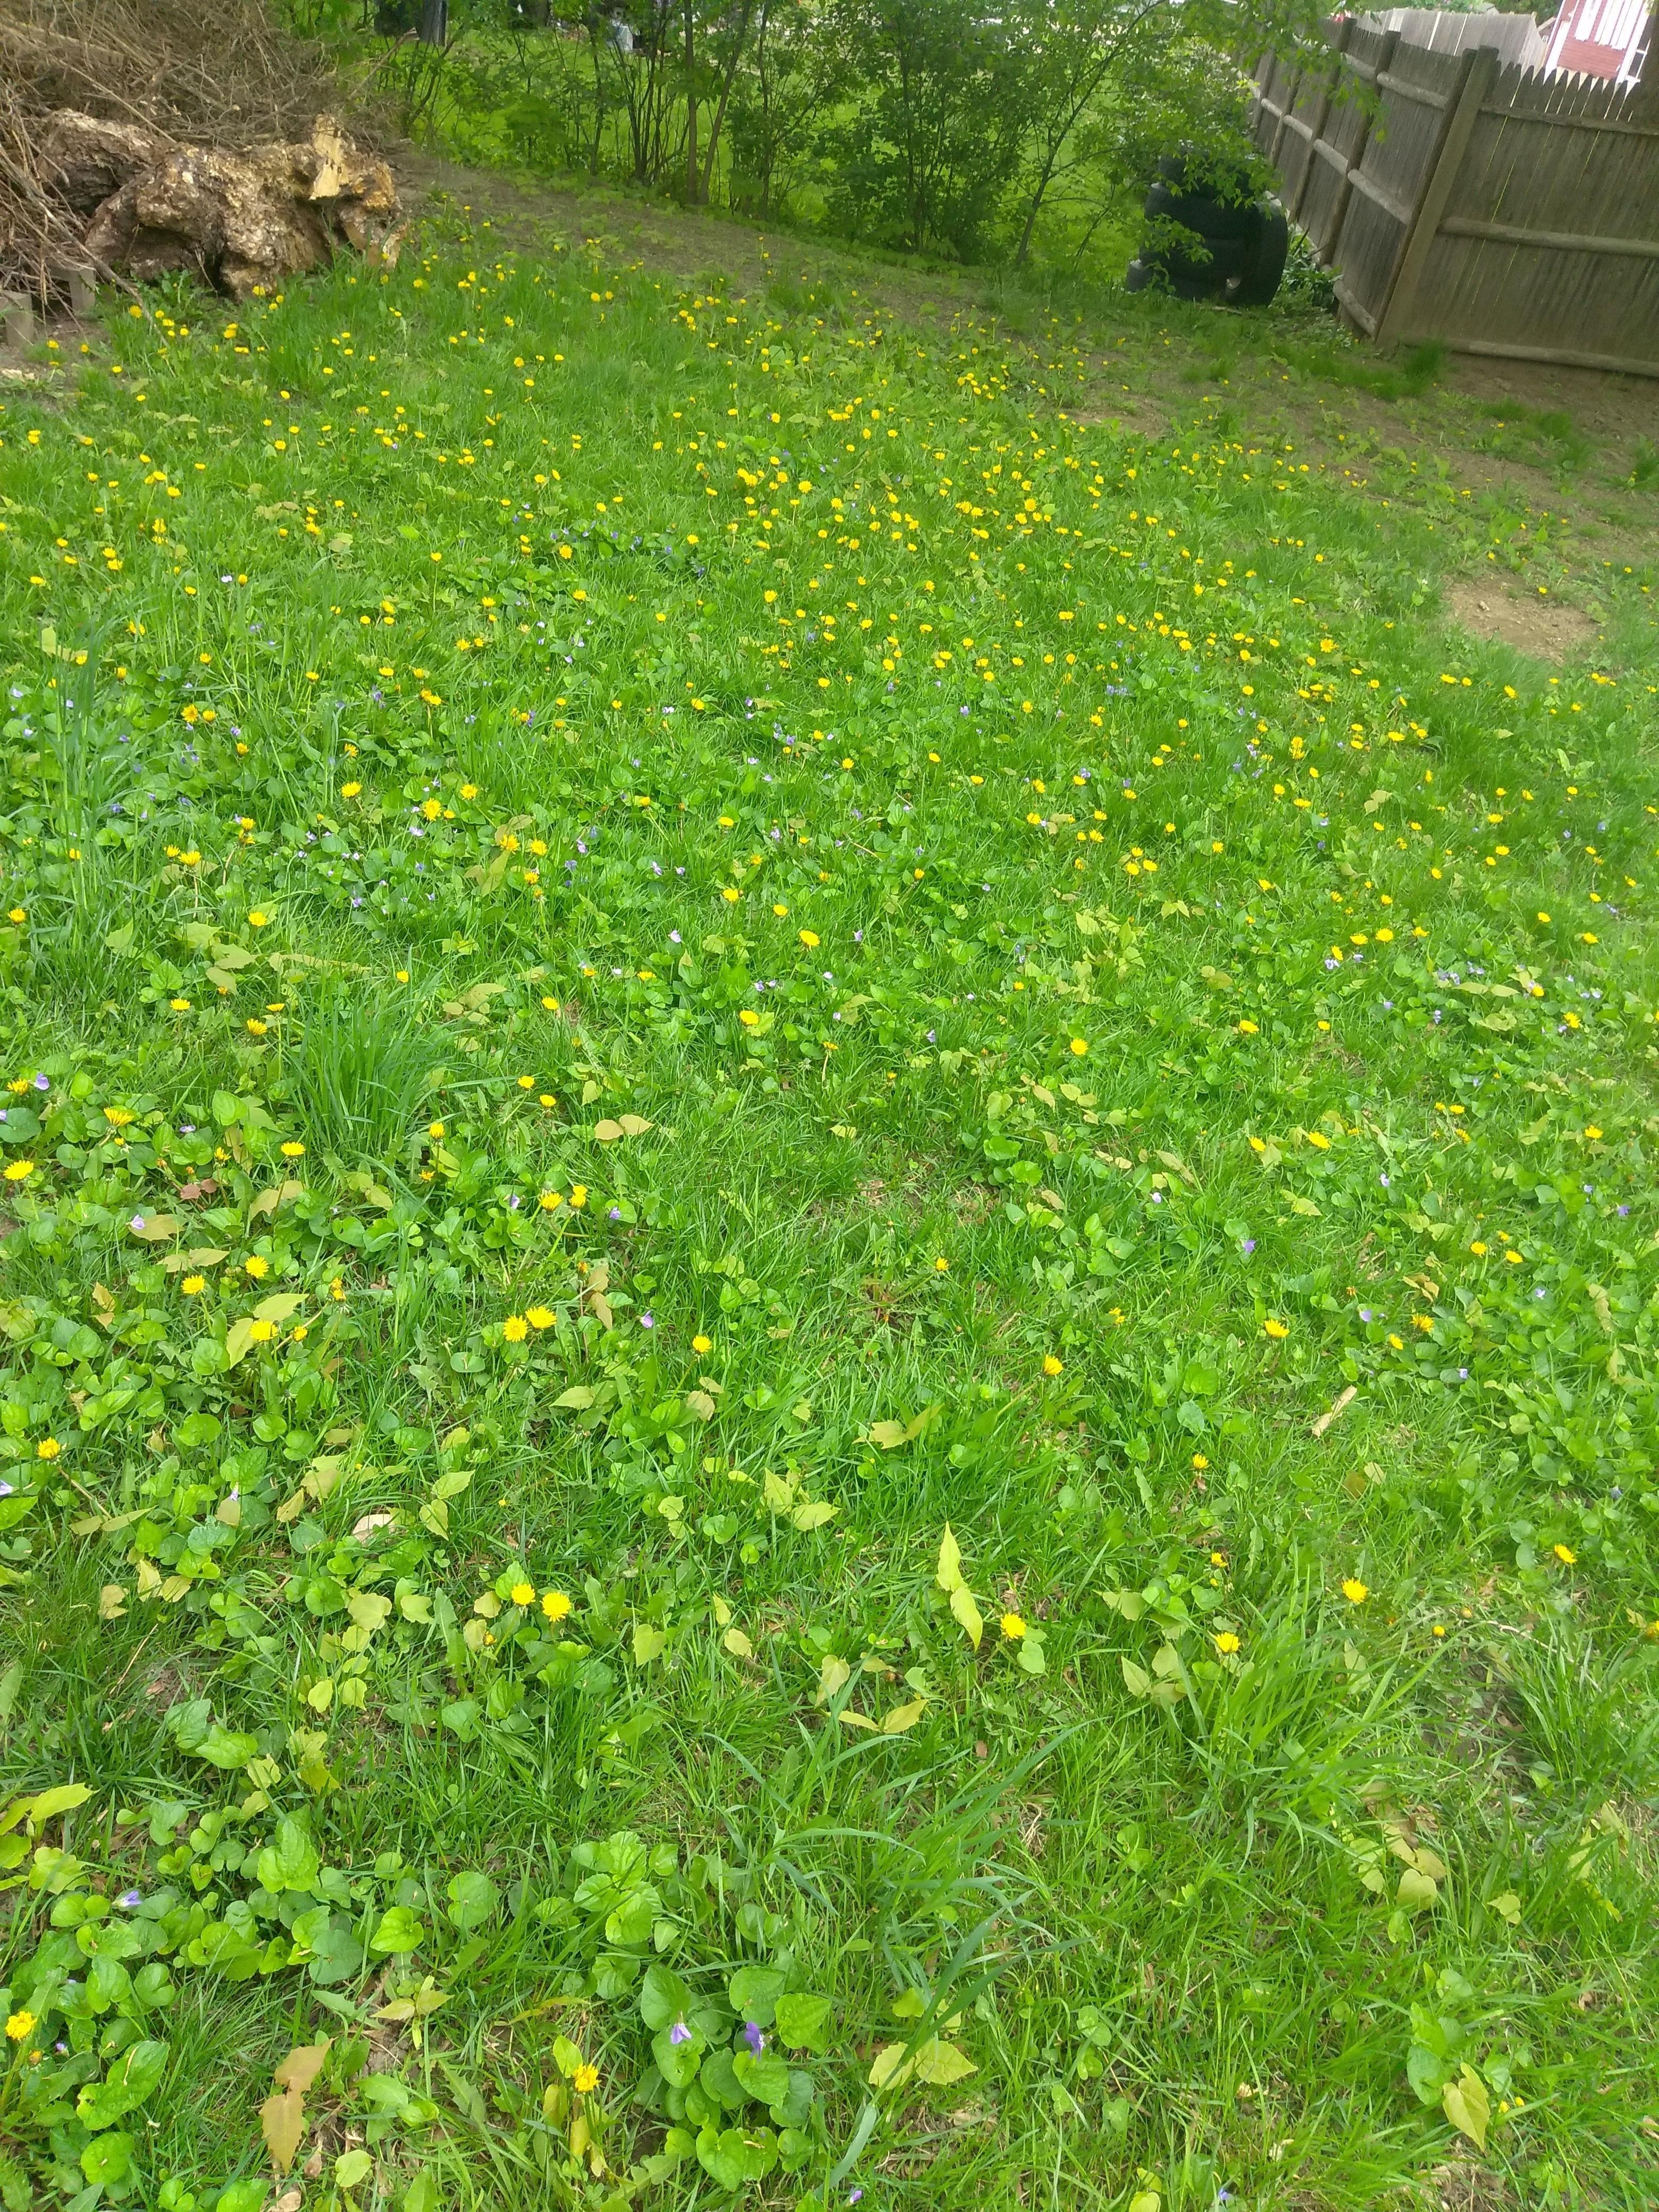 76b7963f6c08c328953918658d196e14 - How To Get Rid Of Corn Speedwell In Lawn